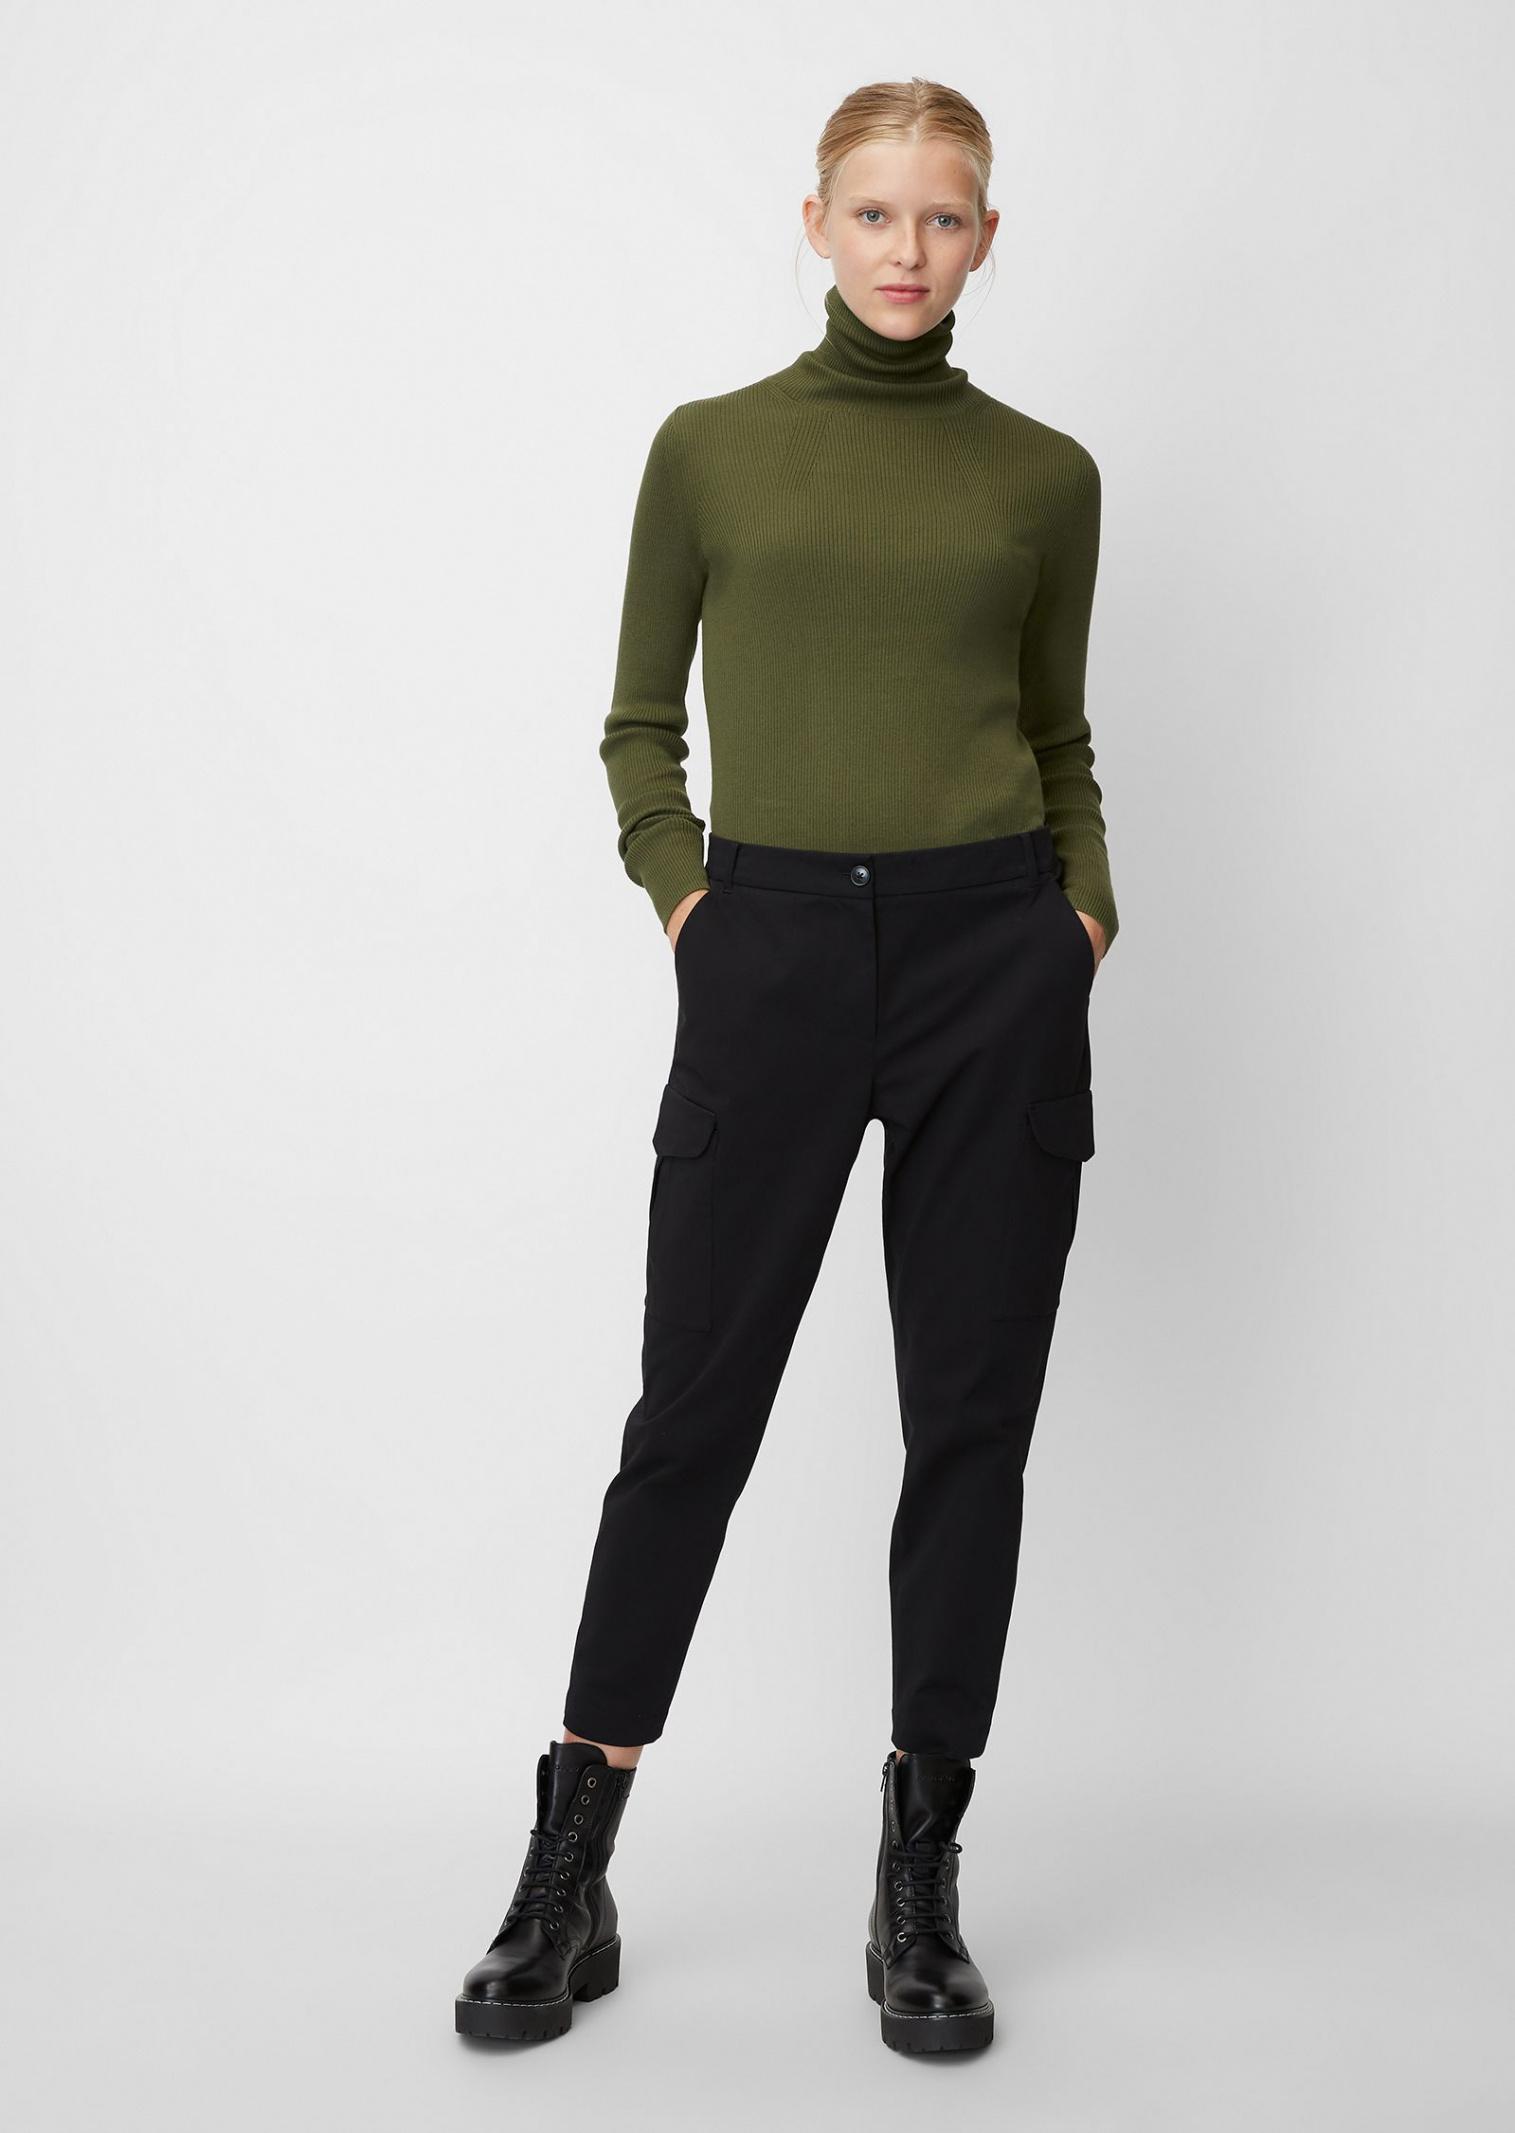 Кофты и свитера женские MARC O'POLO модель PF3859 приобрести, 2017